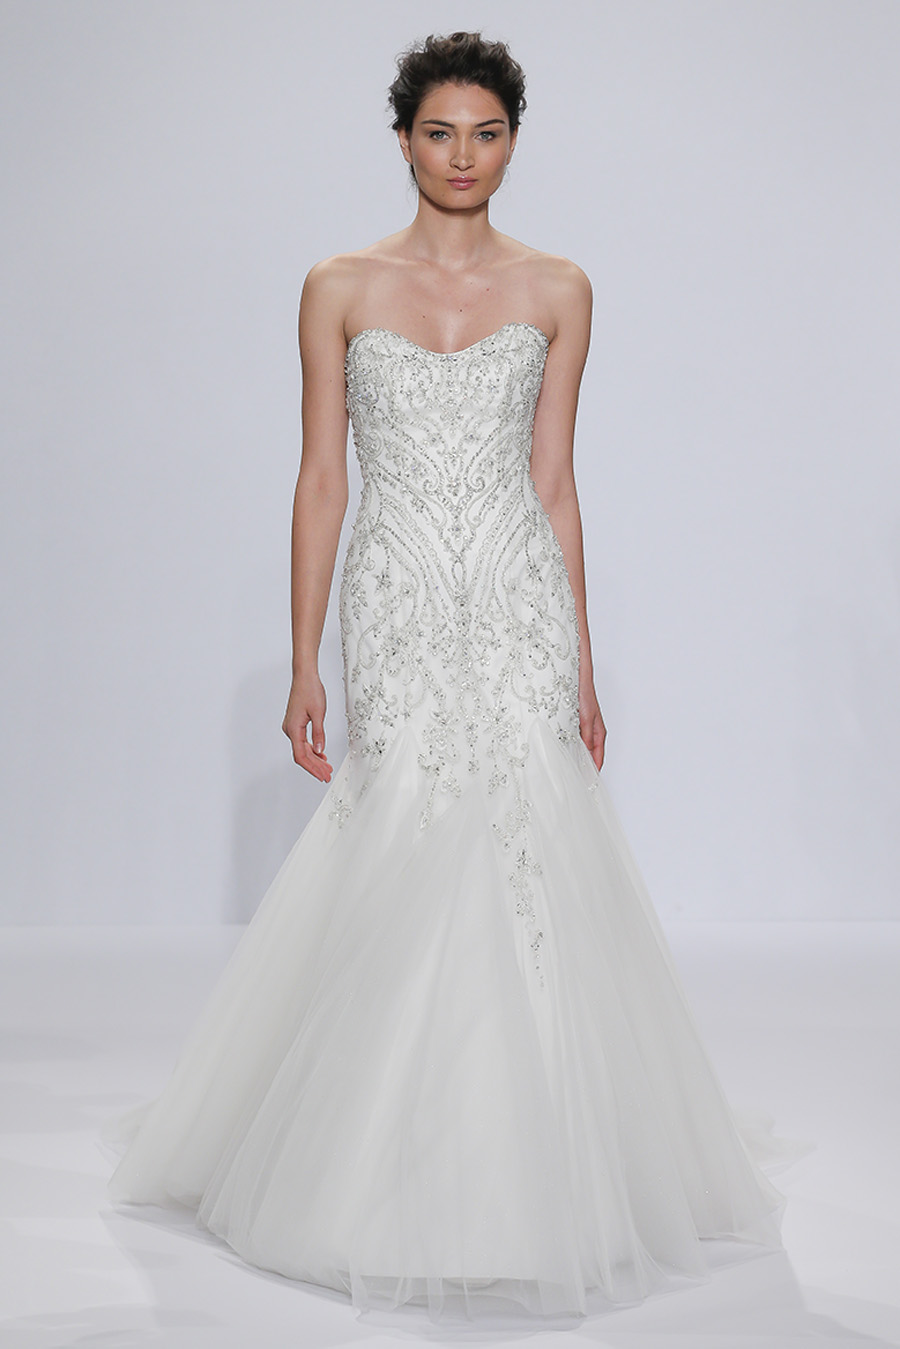 Randy Fenoli Bridal Collection gown 10